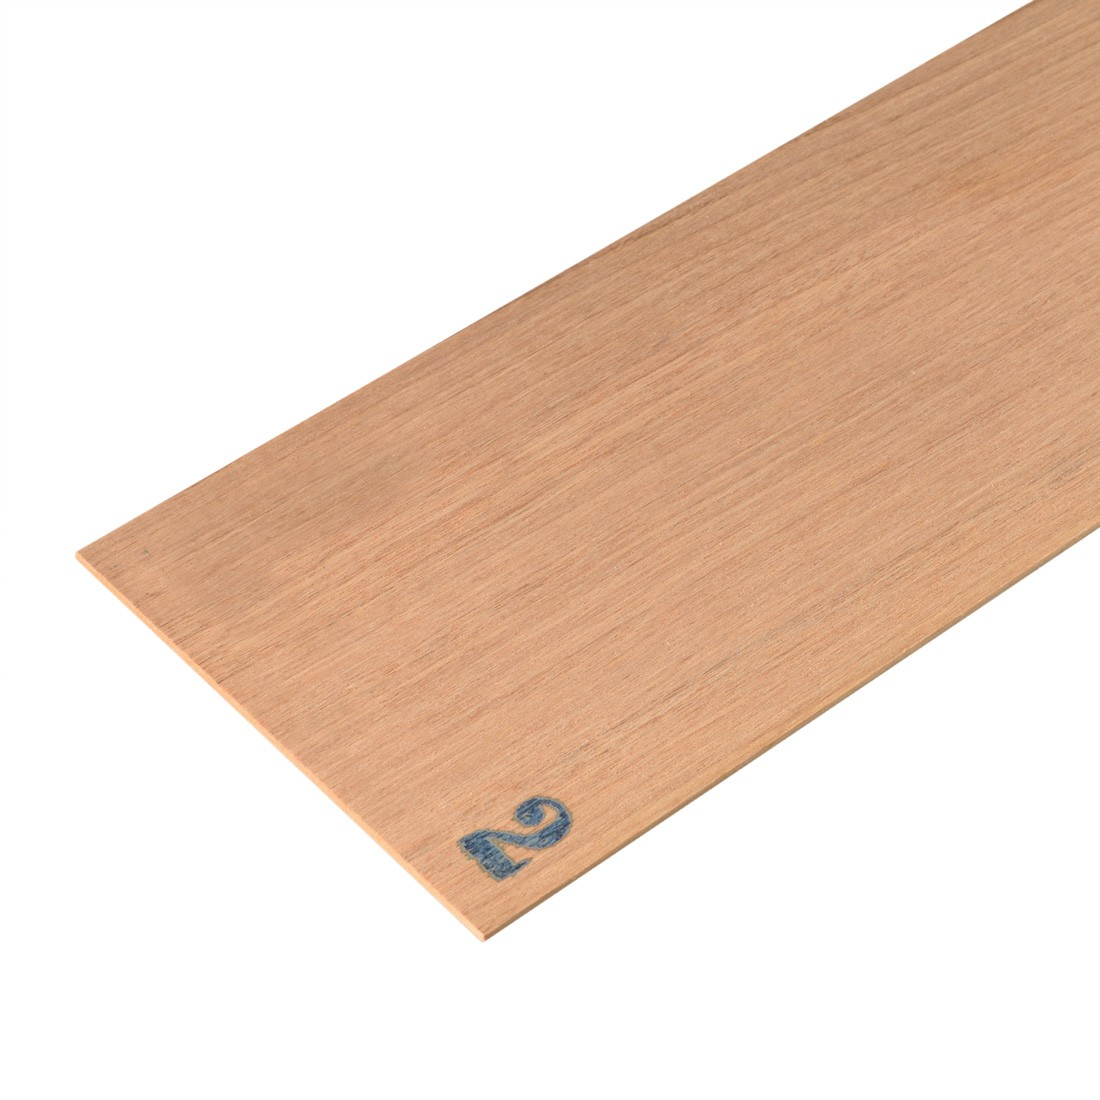 Planches bahia mm.2x100x1000